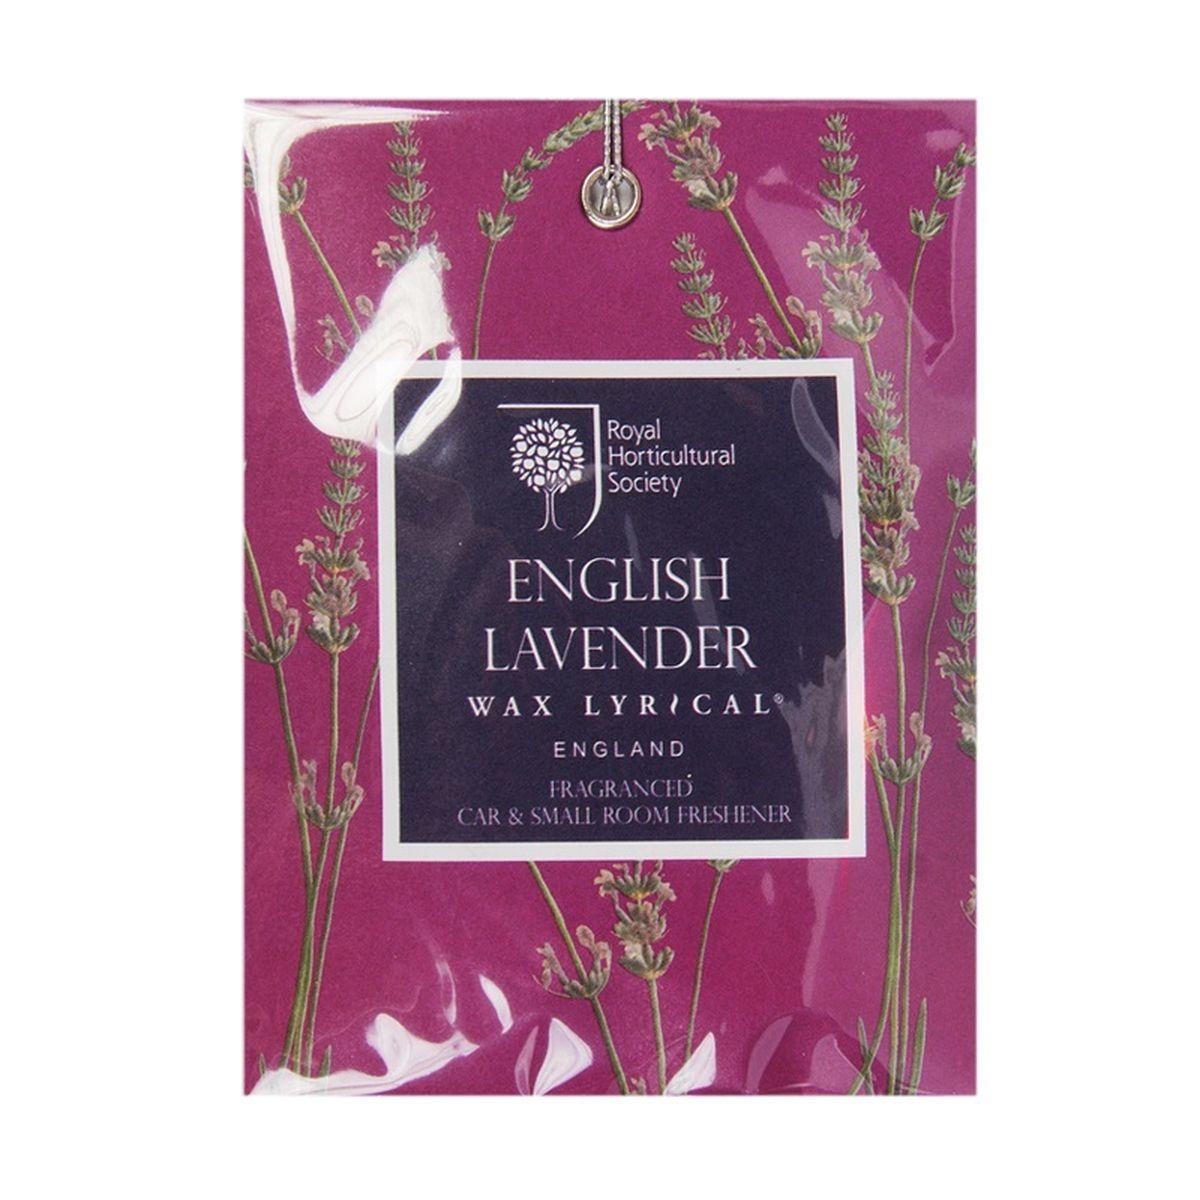 Мини-саше ароматические Wax Lyrical Цветущая лаванда, 20 гRH5810Тонкий аромат английской лаванды с нотками жасмина, бергамота и ромашки.